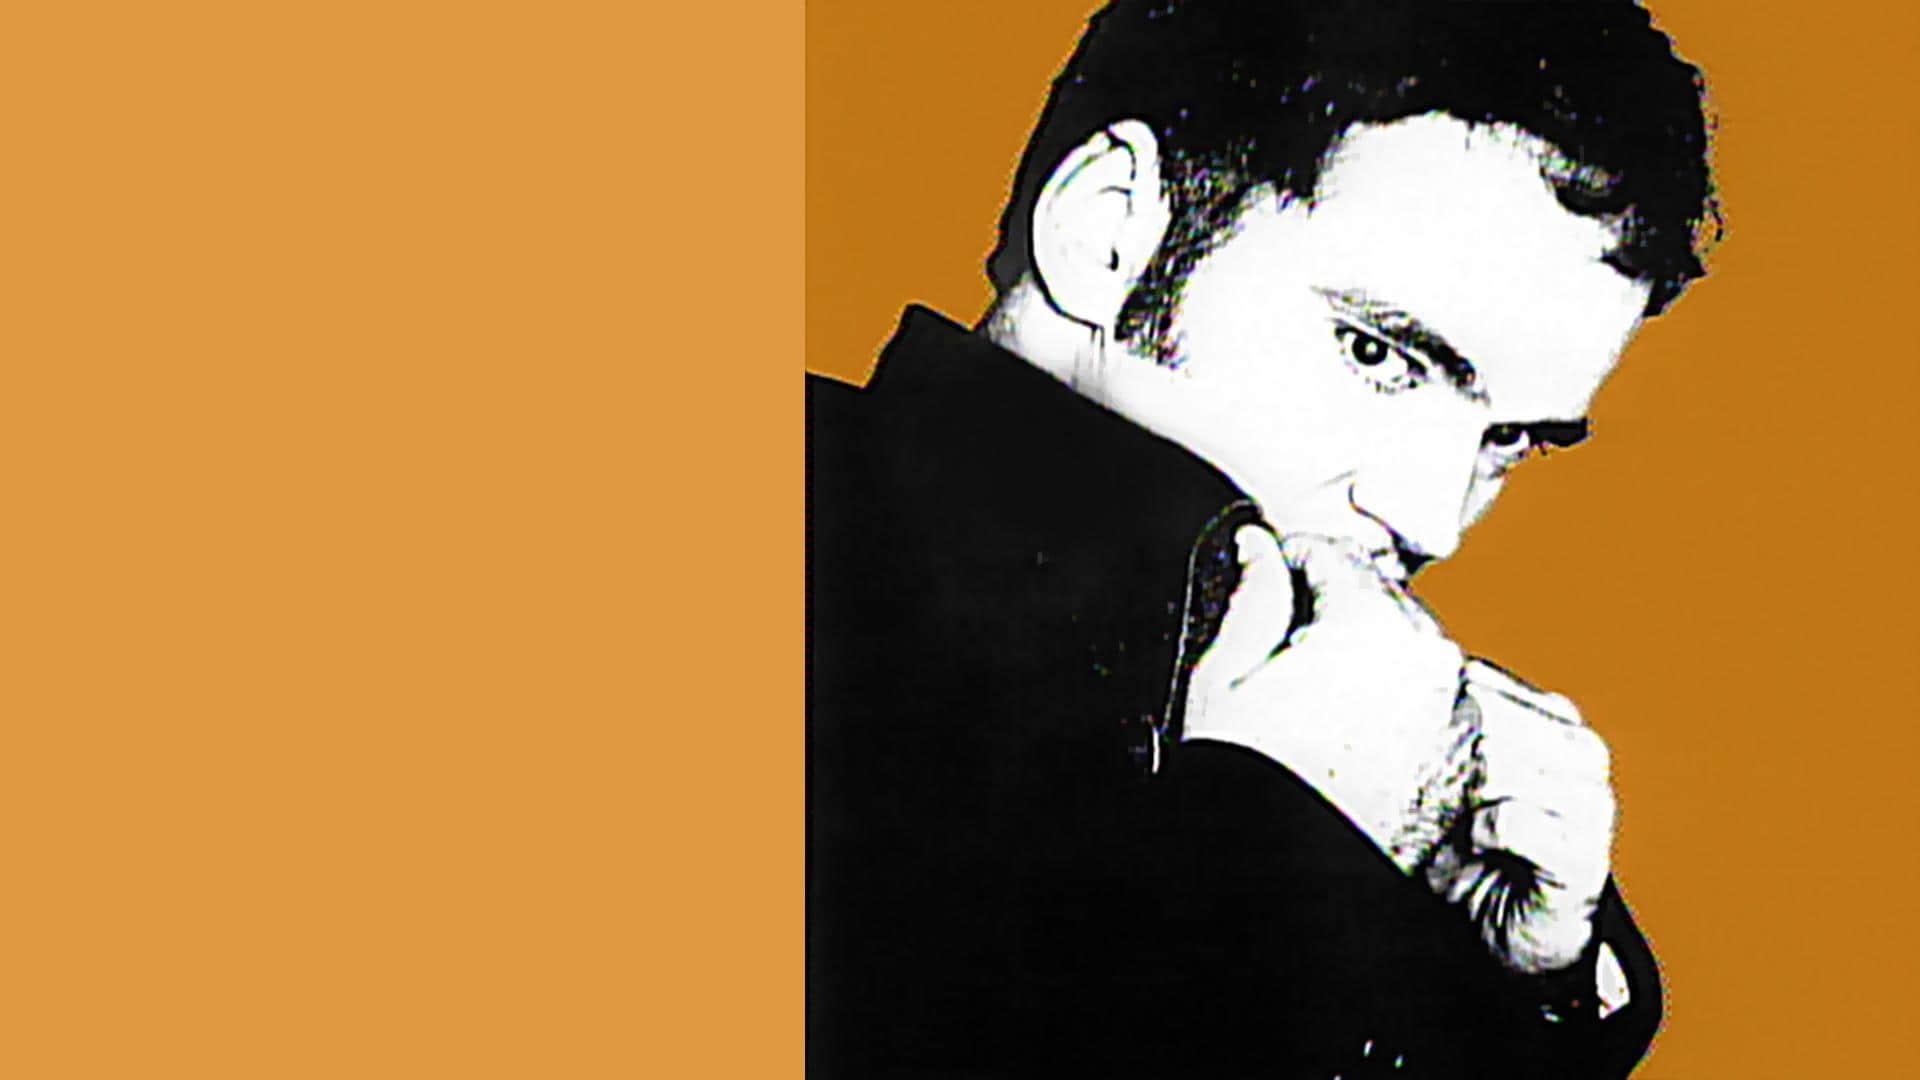 Quentin Tarantino: November 11, 1995